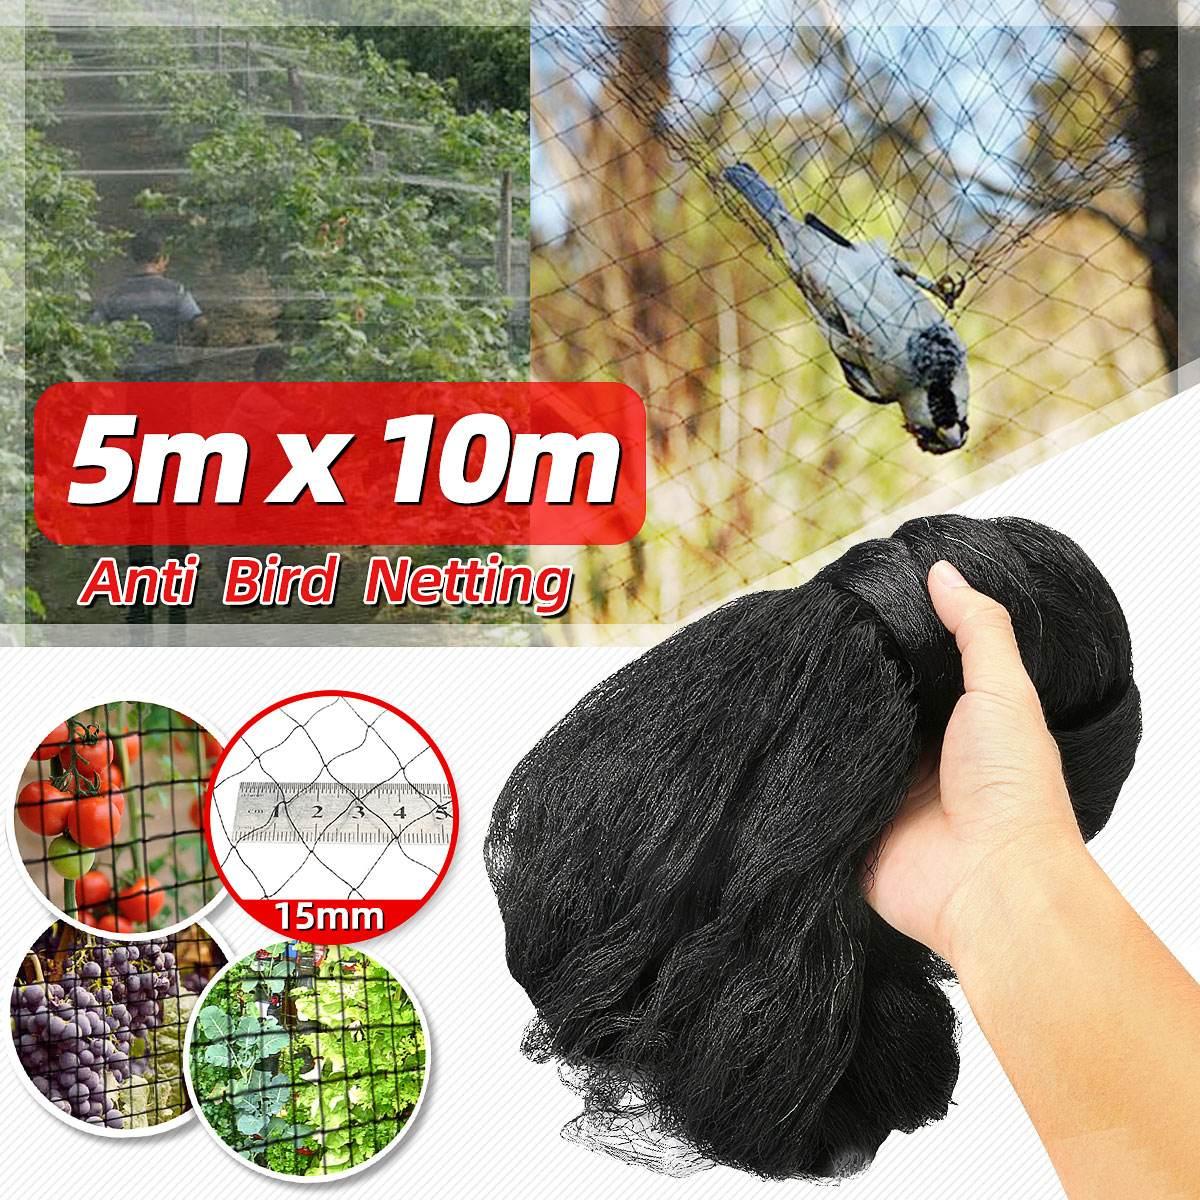 5x10M antiaves, Catcher para cultivos, Control de plagas, Protector de malla de árbol para jardín, red roja para estanque, trampas de red para pesca, herramientas para agricultura